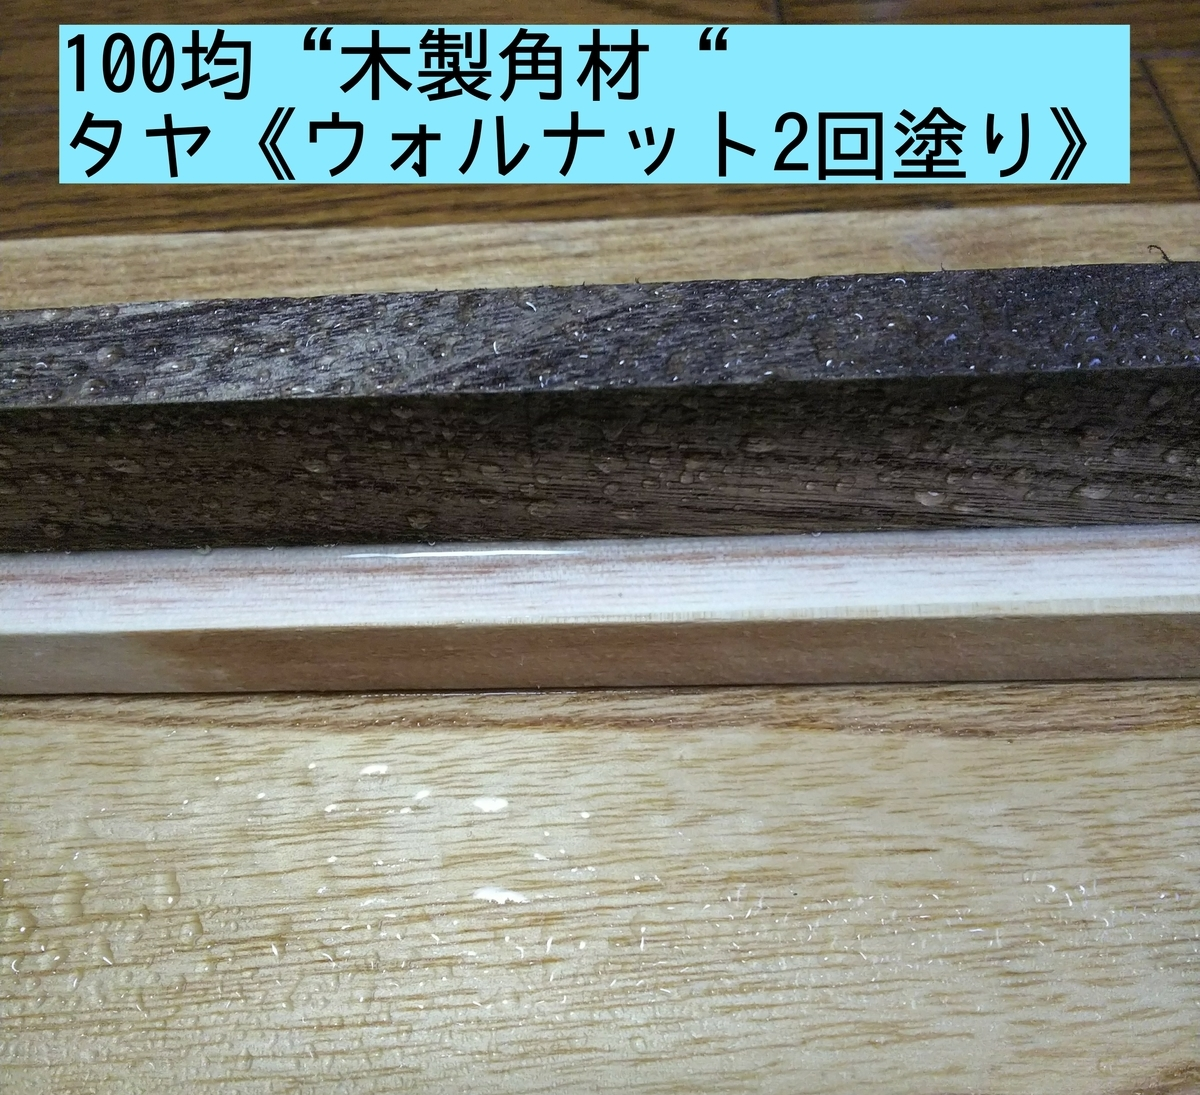 f:id:natsumikandiy:20210101133552j:plain